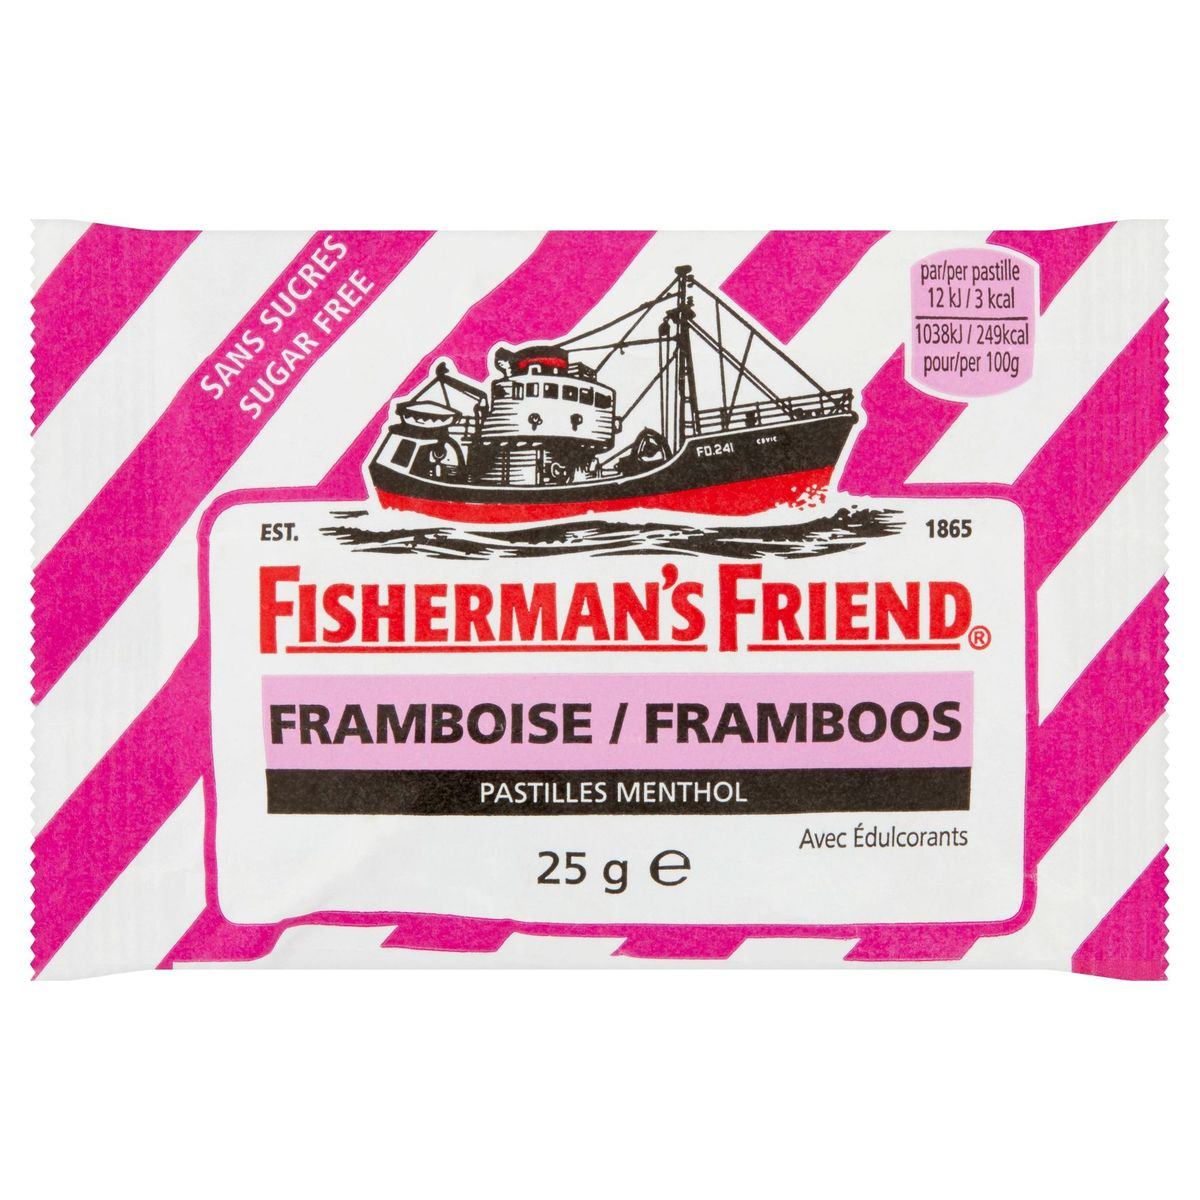 Fisherman's Friend Framboos Pastilles Menthol 25 g